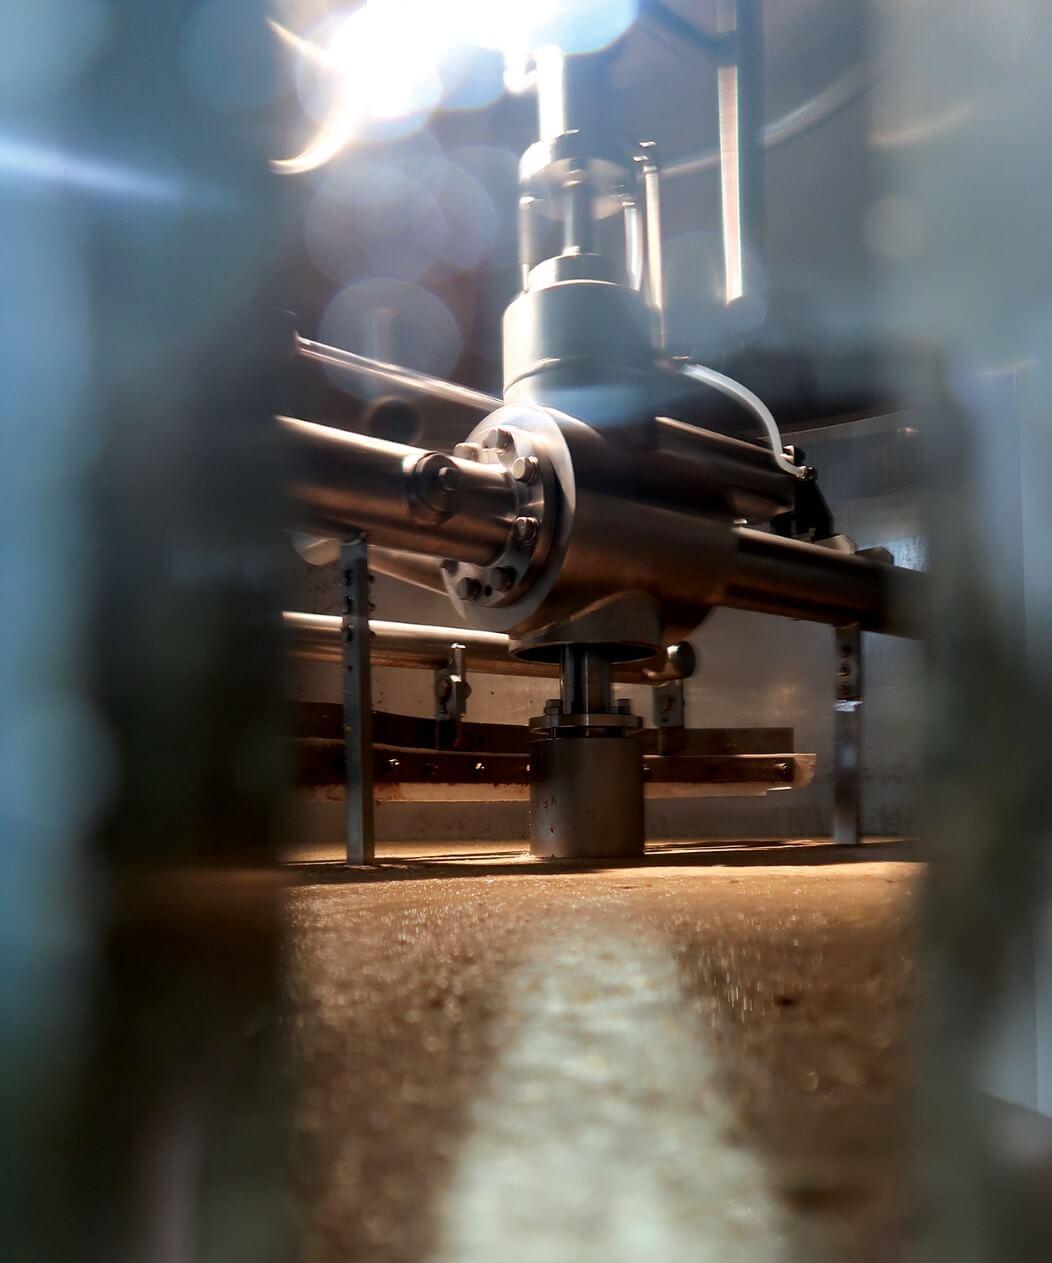 A peek into the mashtun through the side-glass